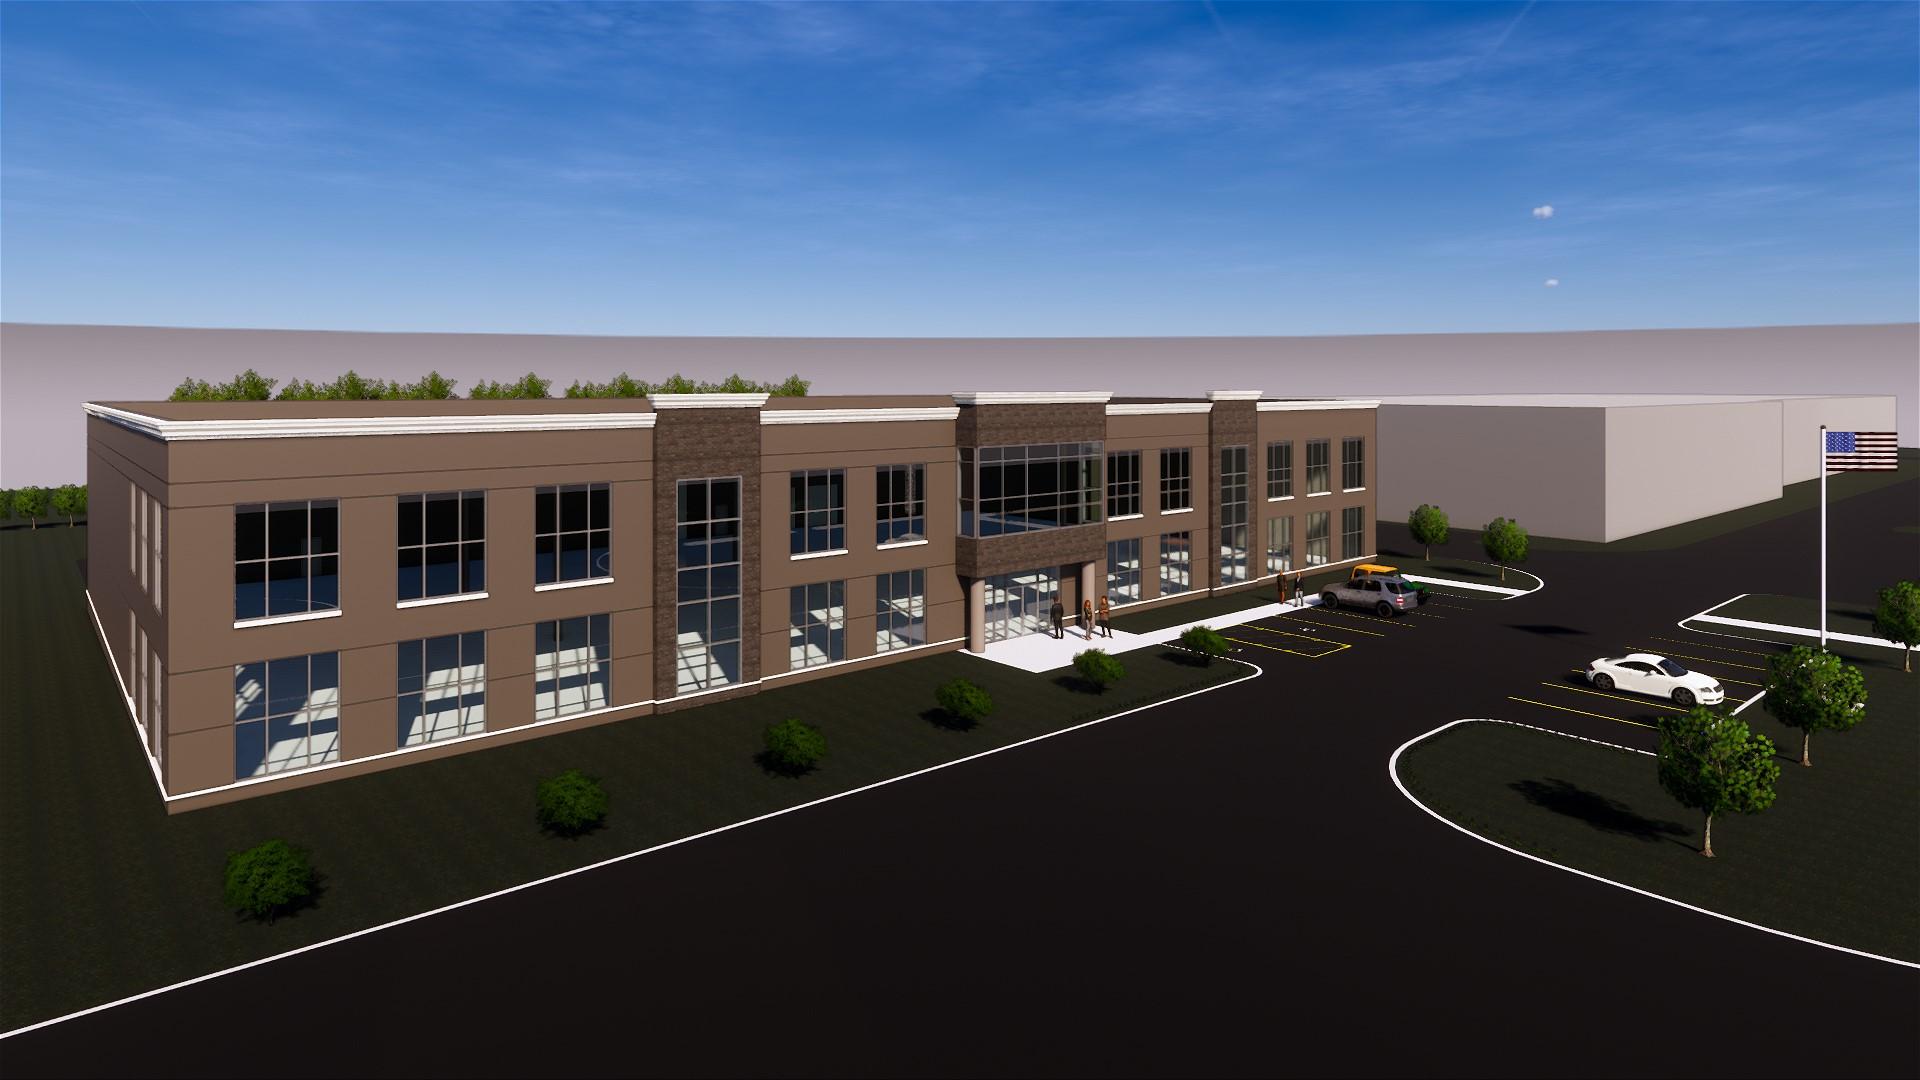 12200 Plantside Drive Proposed Building1.jpg